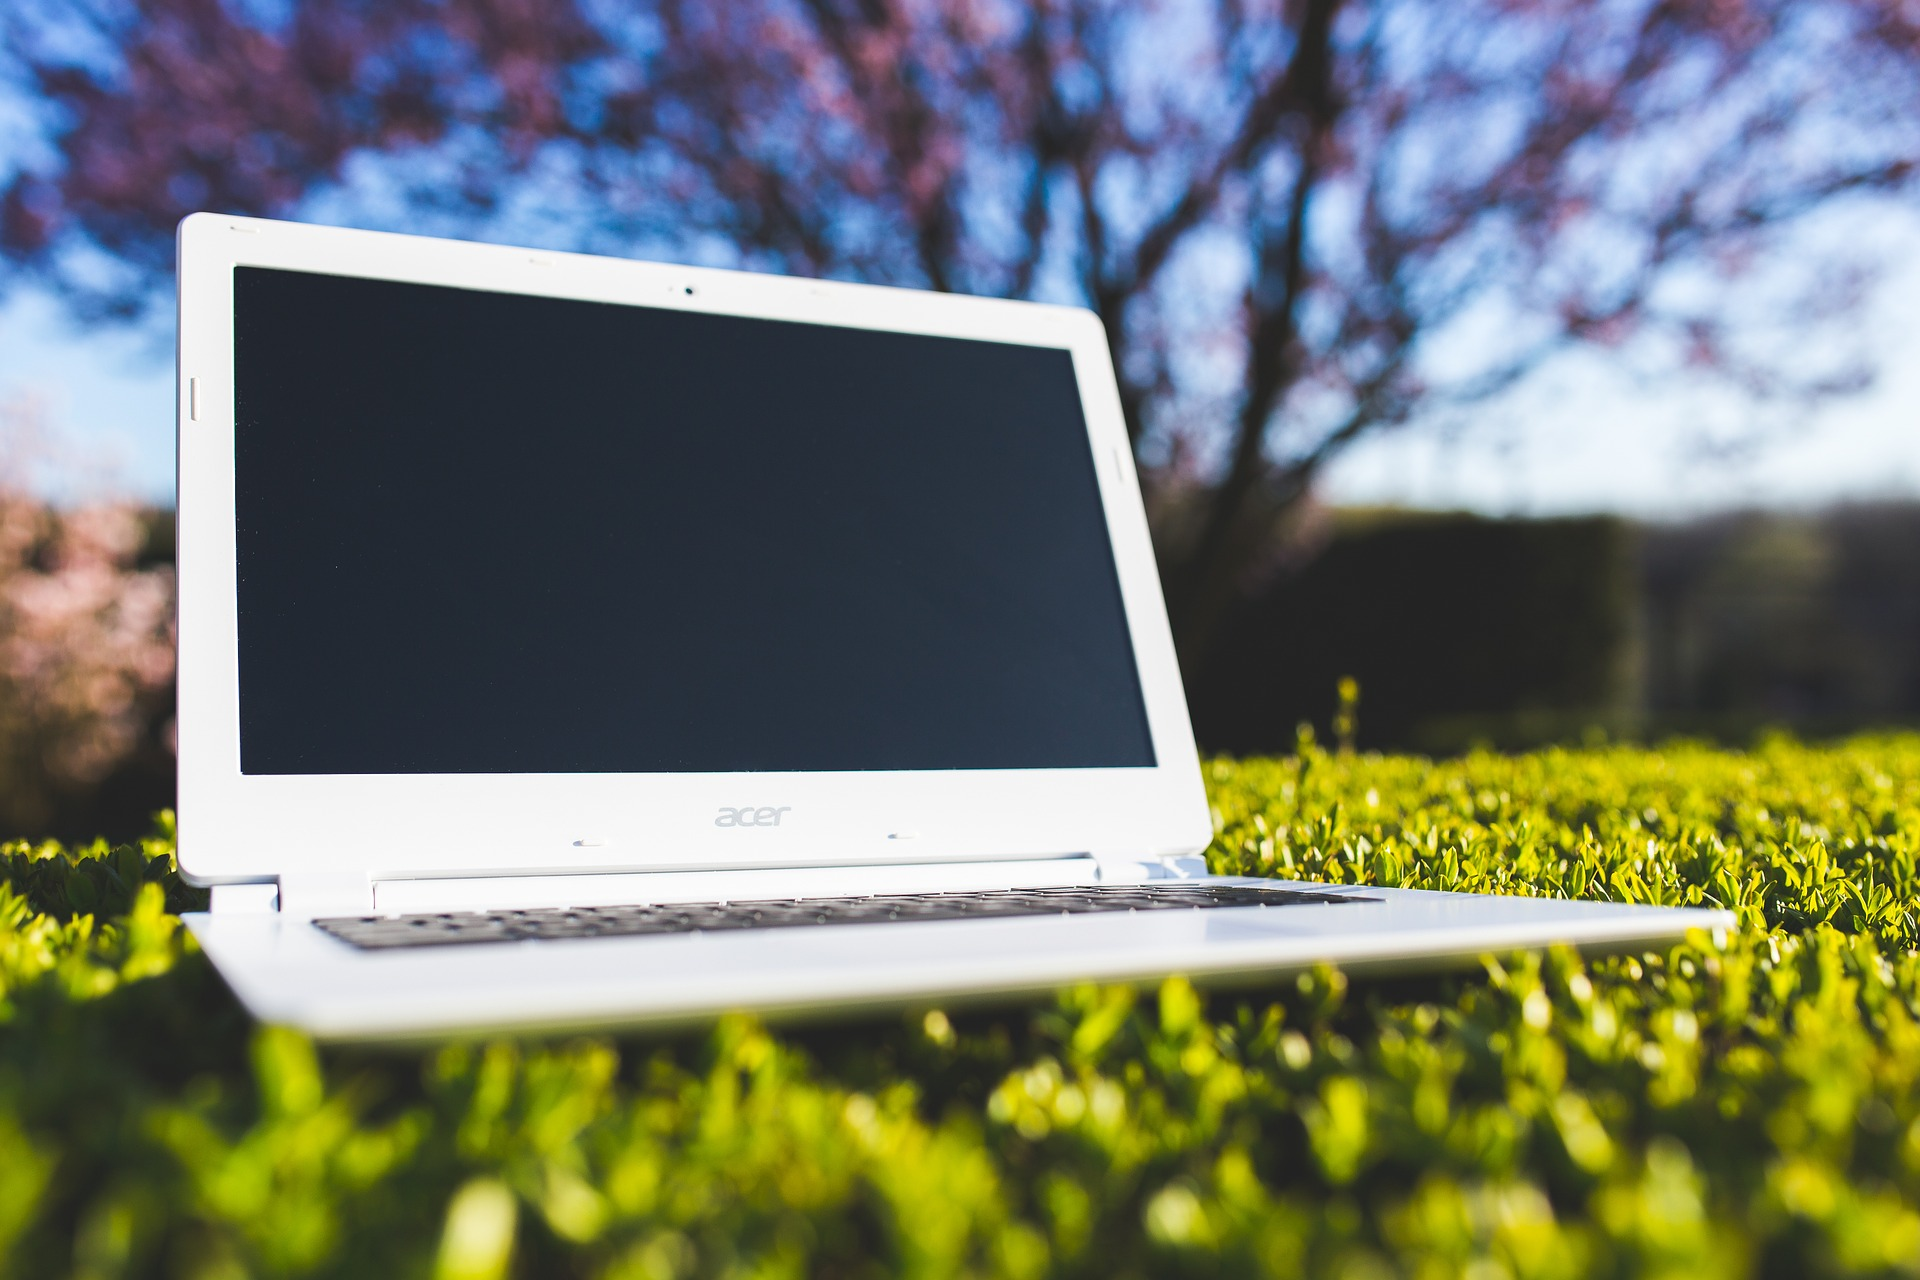 laptop-762548_1920.jpg